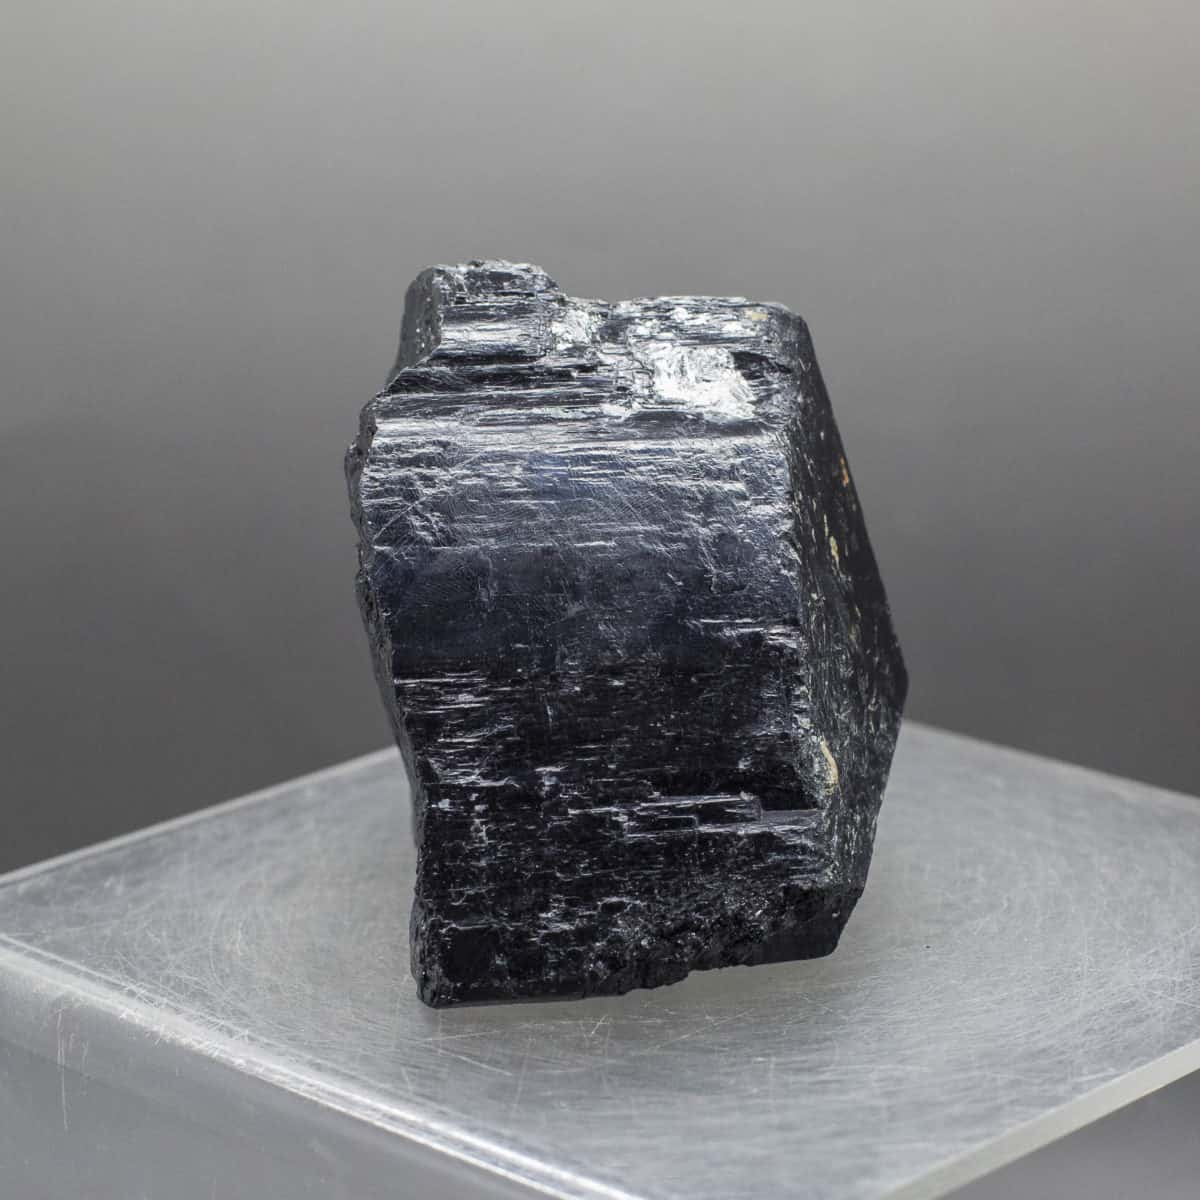 Black Tourmaline Crystal (6)